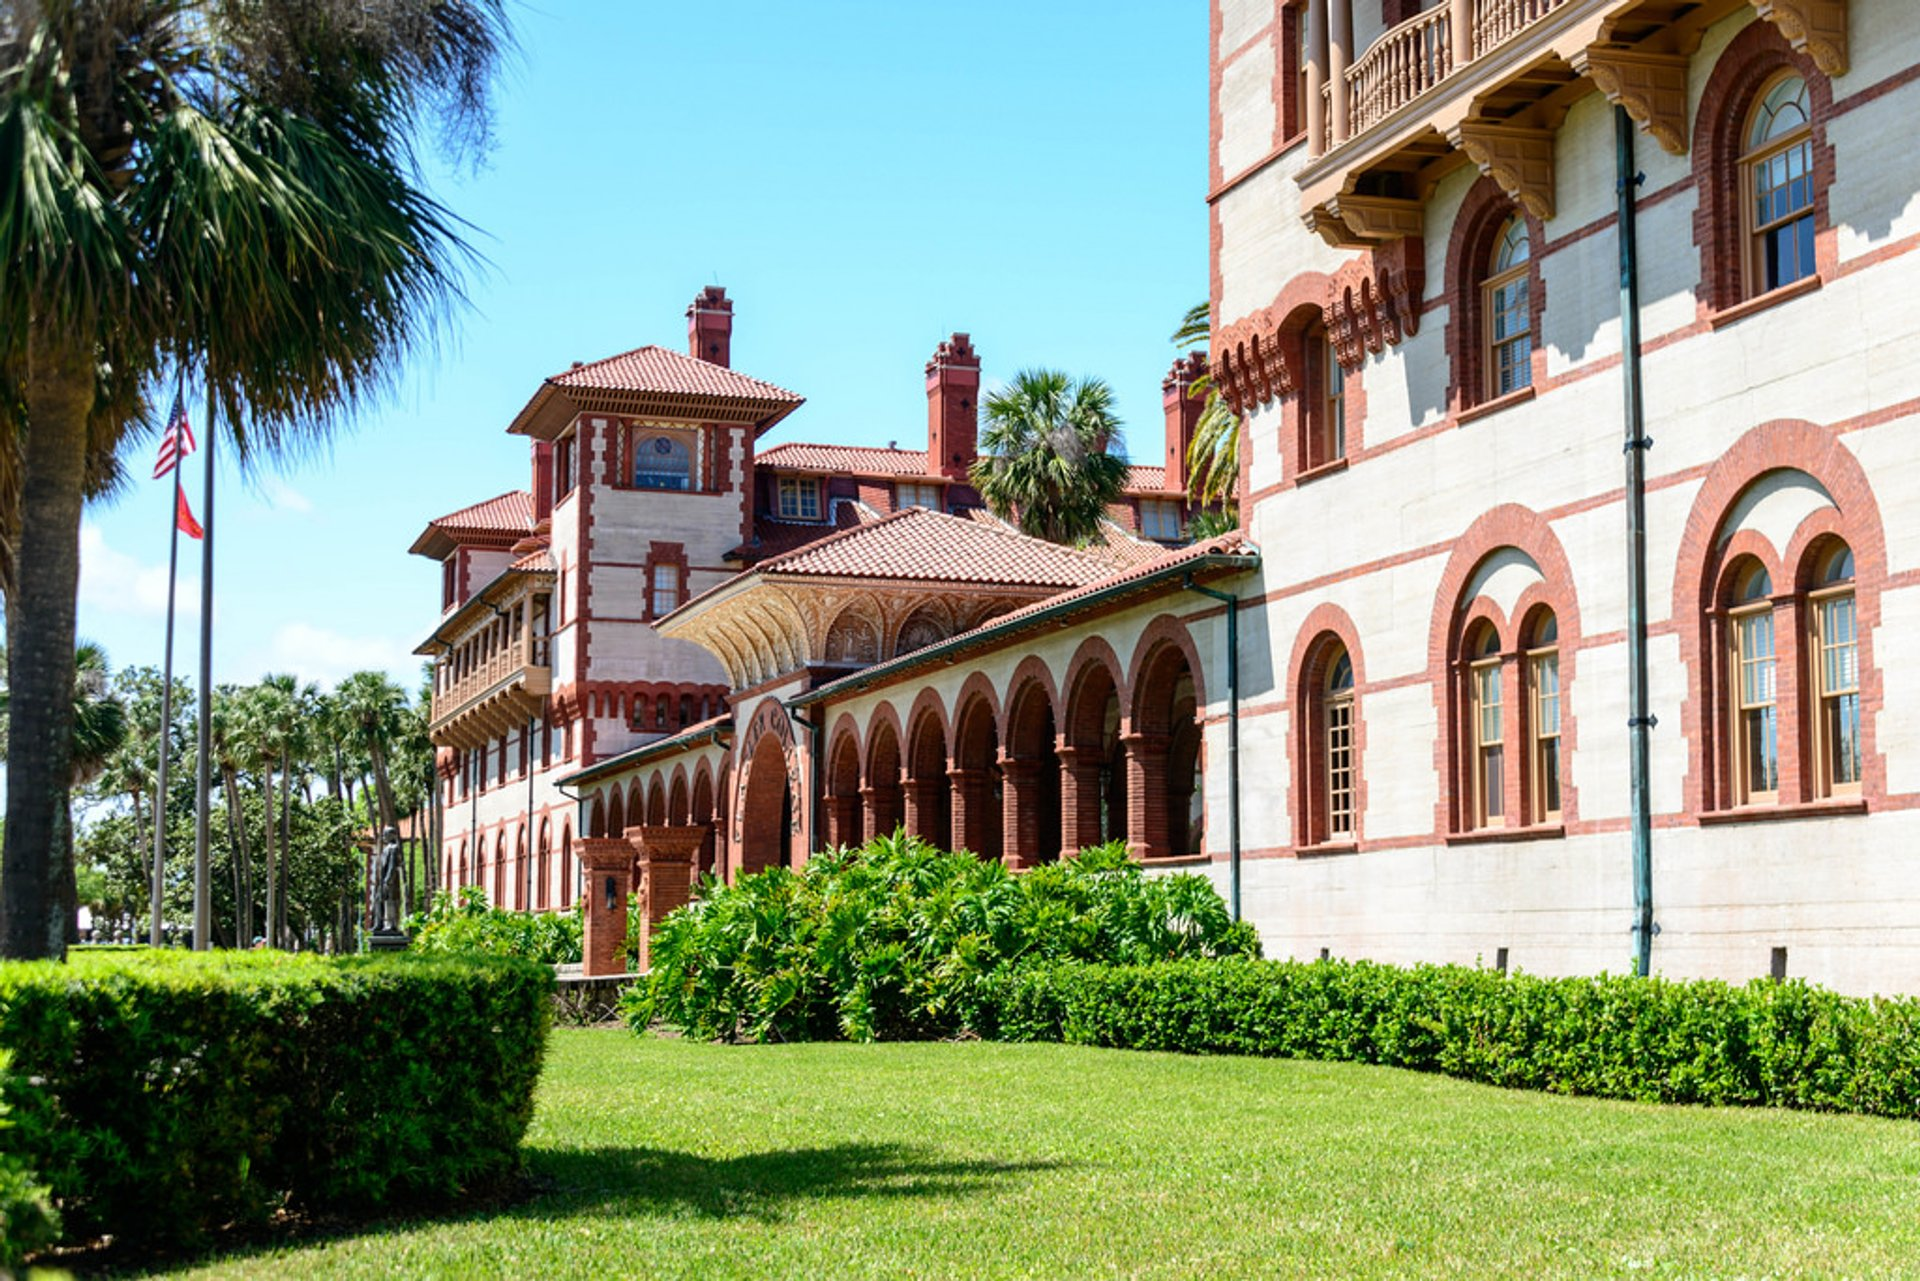 Ponce de Leon Hotel (Flagler College) in Florida - Best Season 2020